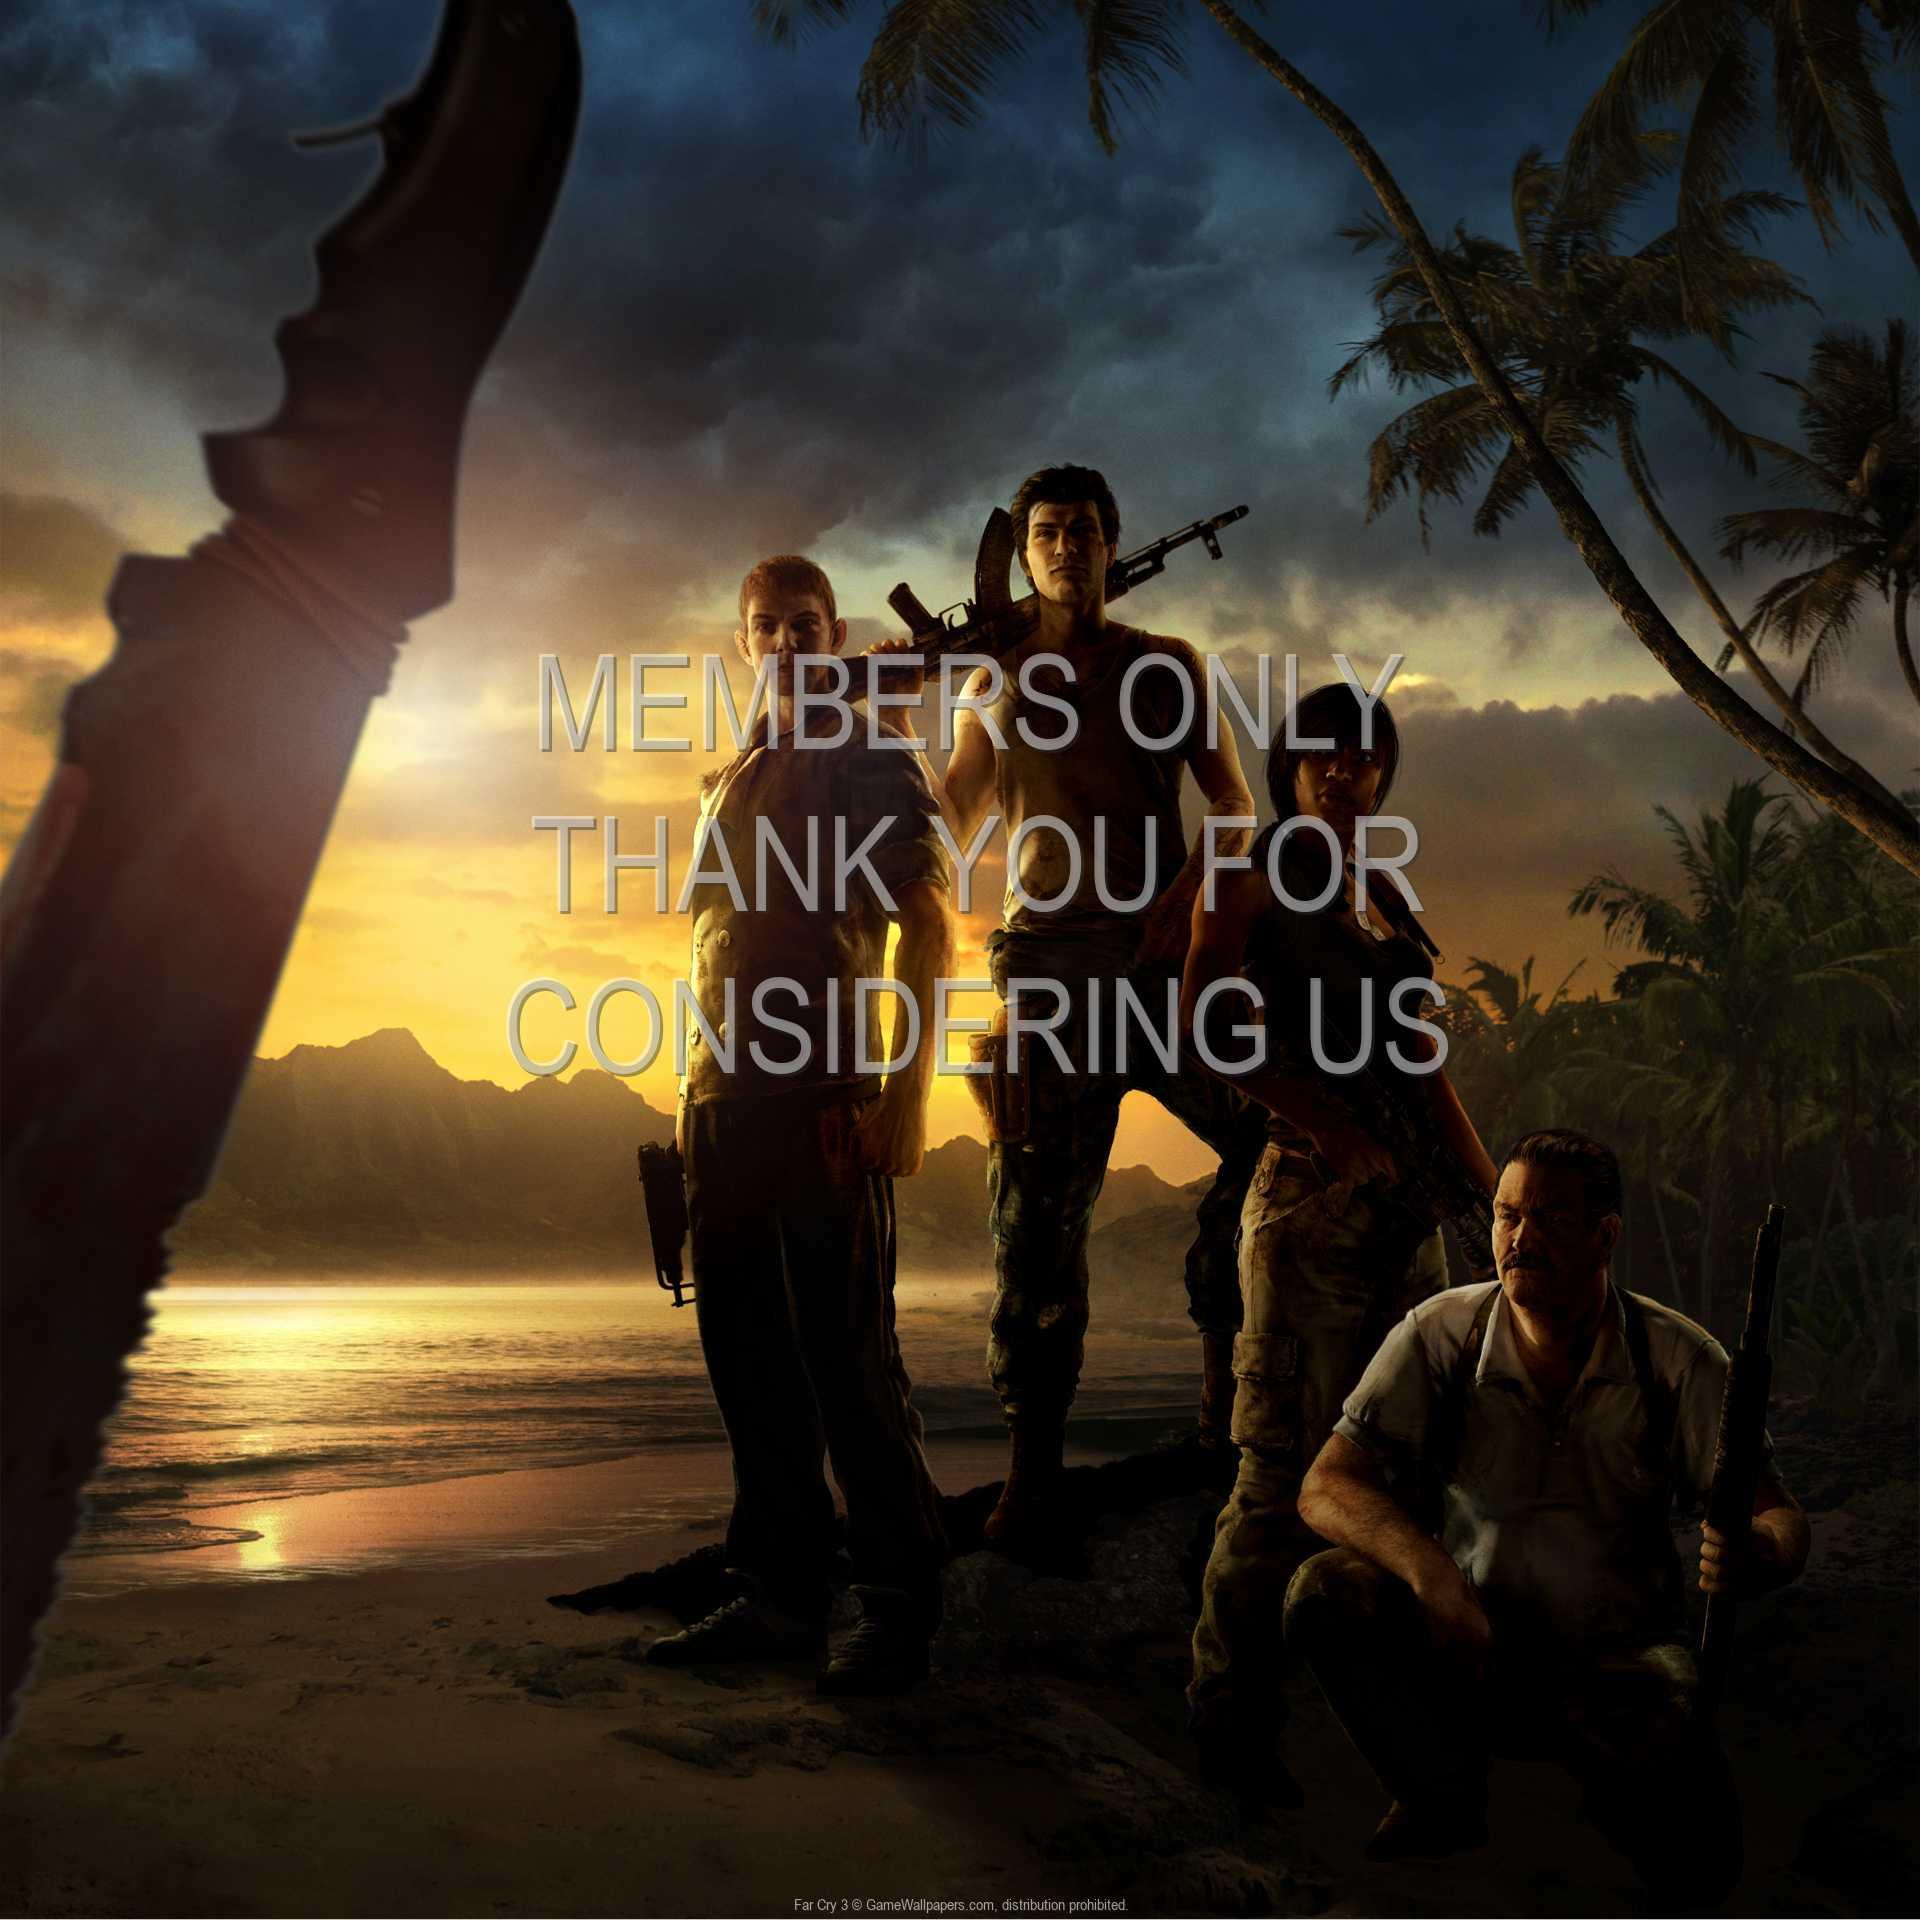 Far Cry 3 Wallpaper 07 1080p Horizontal